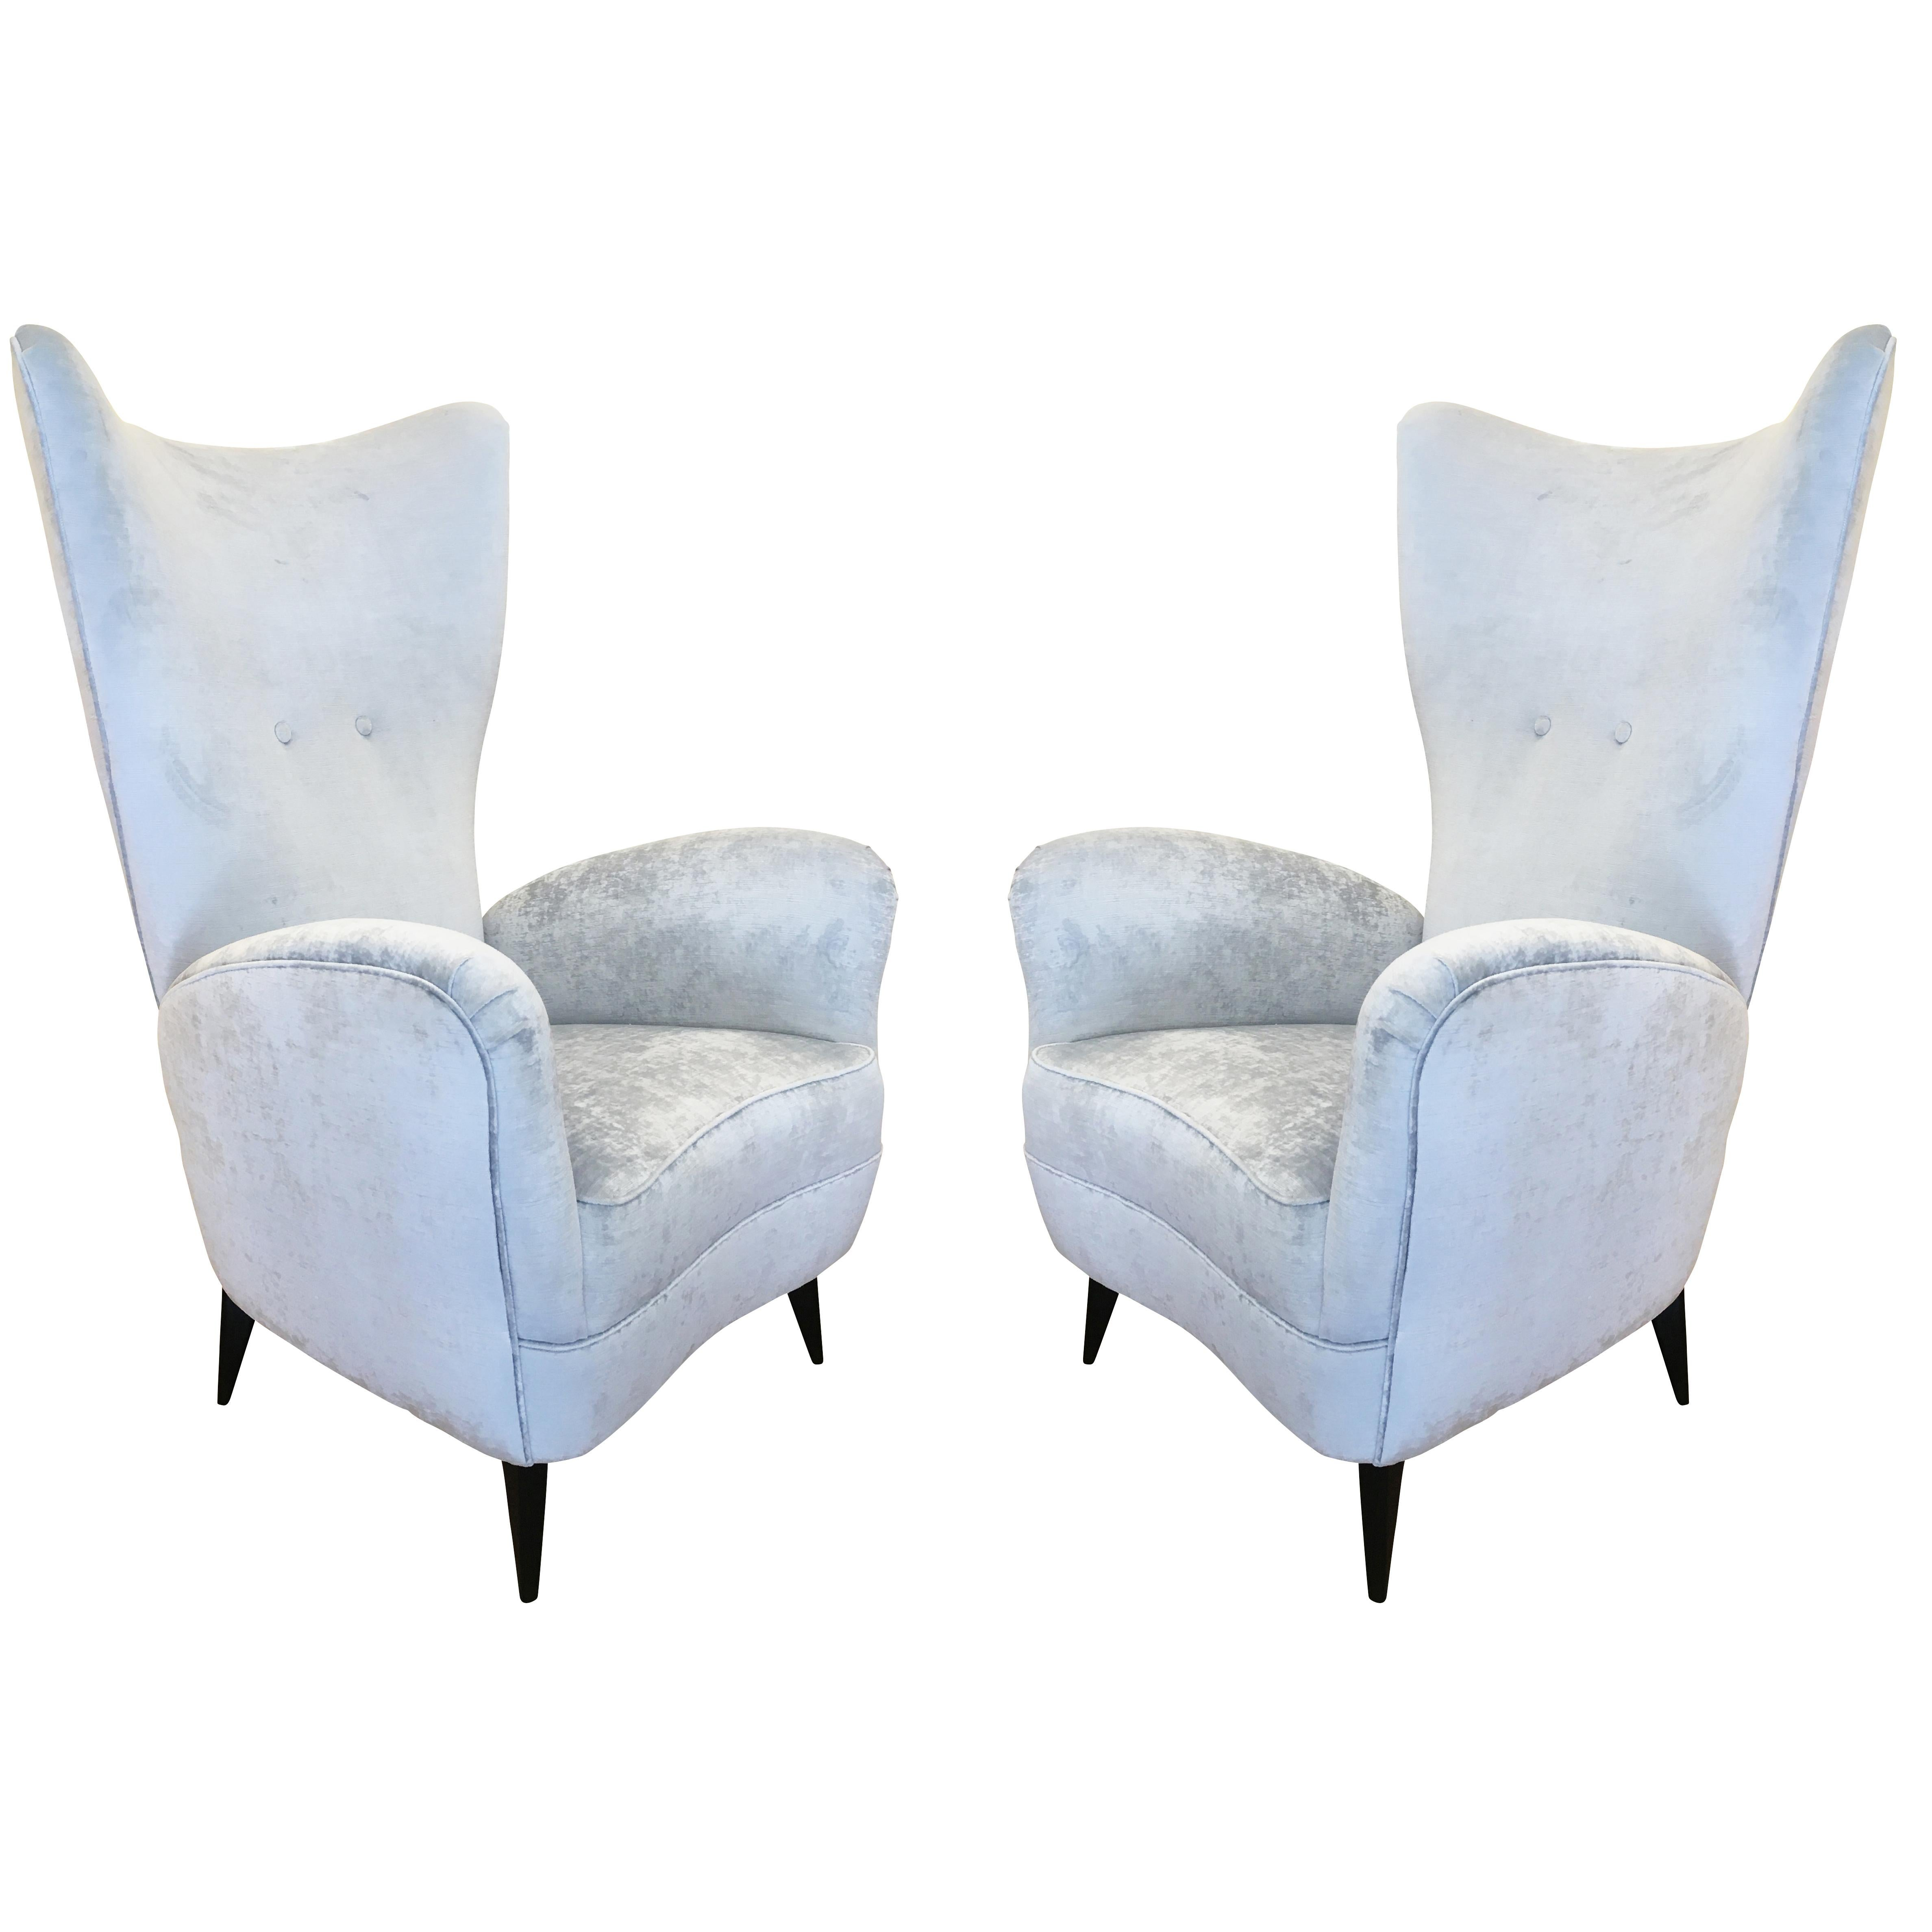 Pair of Italian Midcentury Lounge Chairs